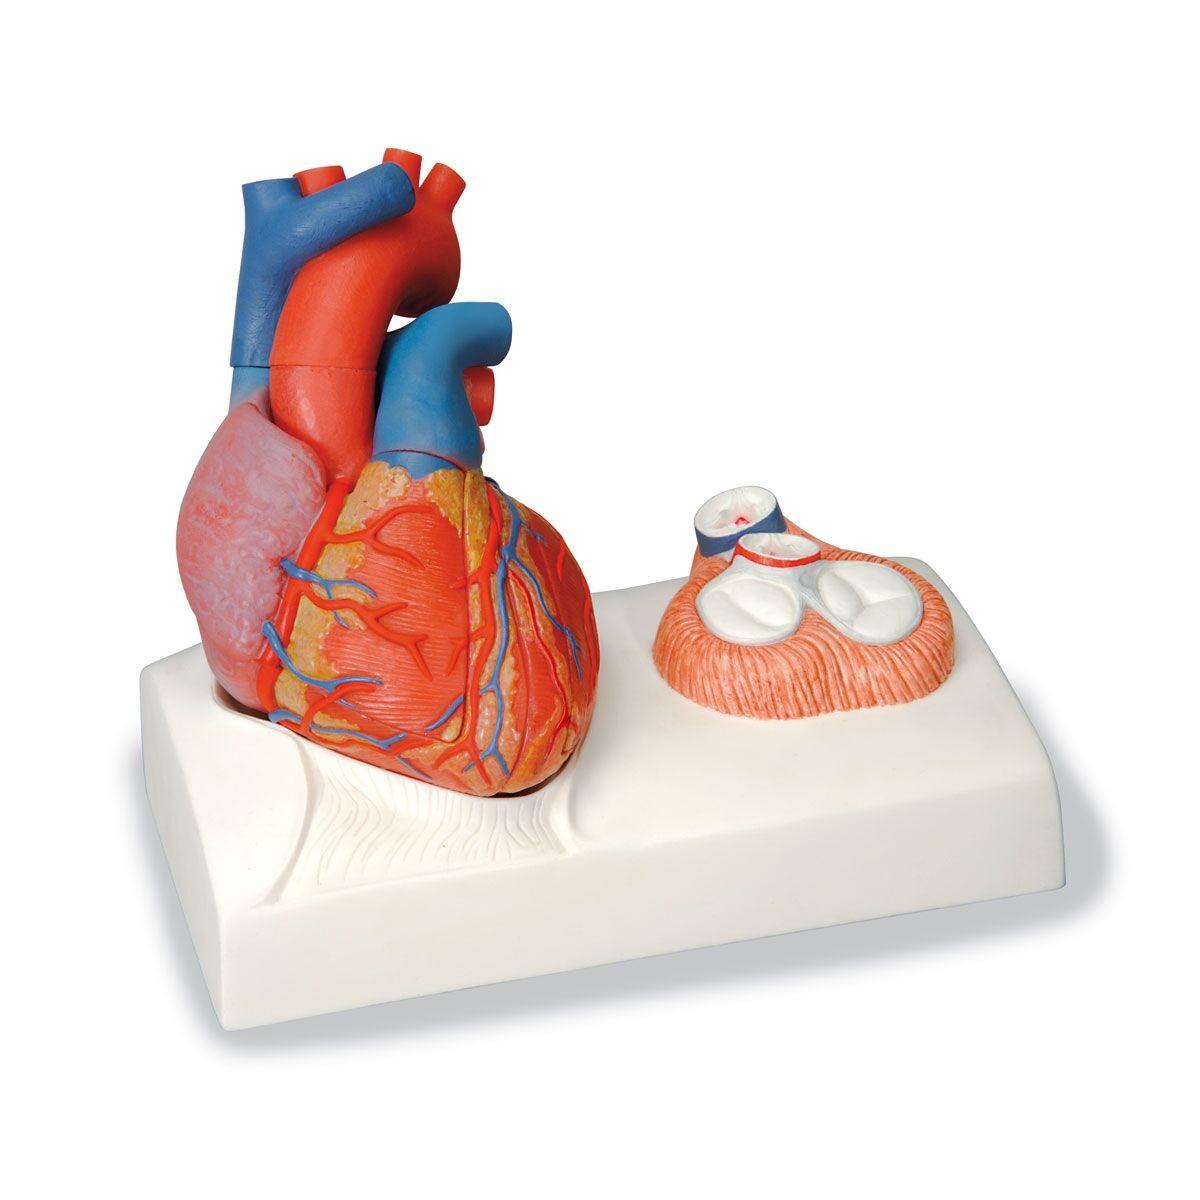 3b Life Size Heart Circulatory System Human Anatomy Biology